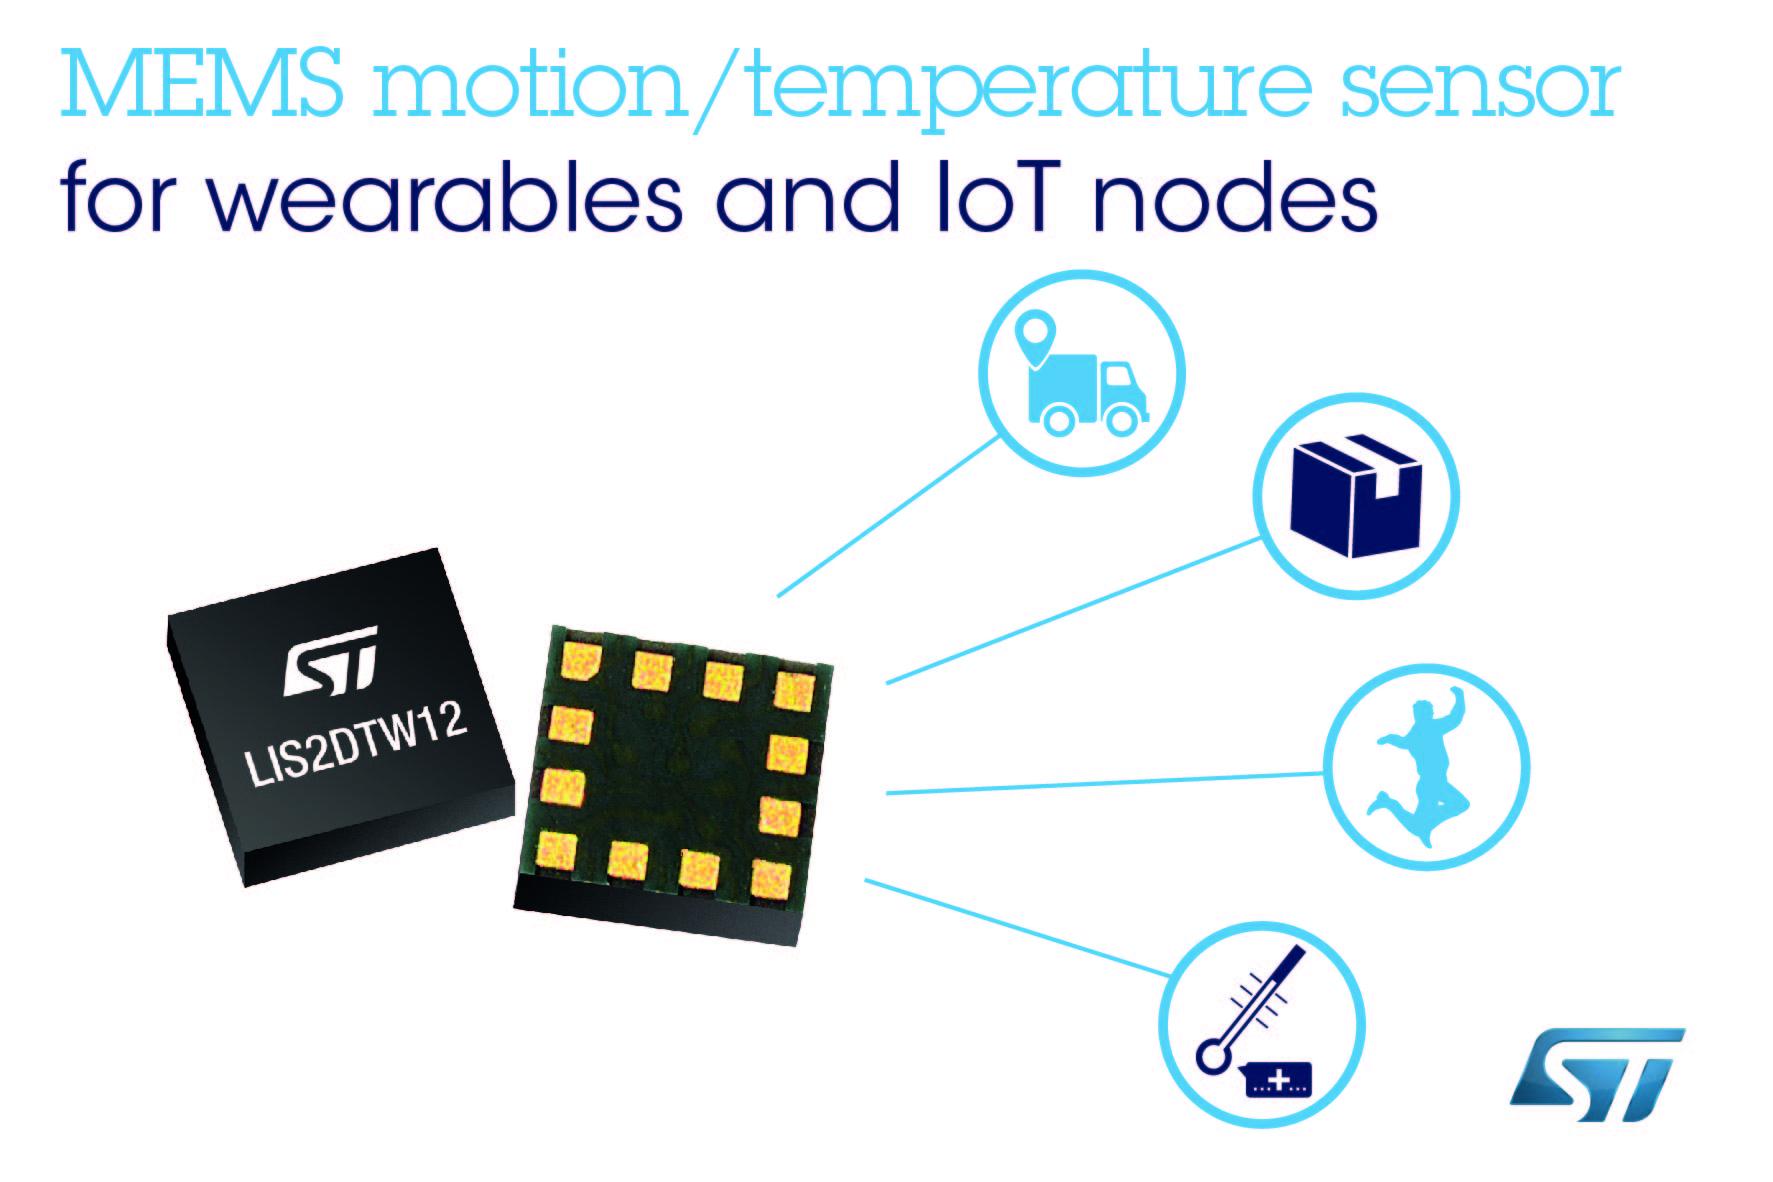 ST新闻稿4月23日——MEMS芯片整合加速度计与高准确度温度传感器,实现出色的测量精确度.jpg